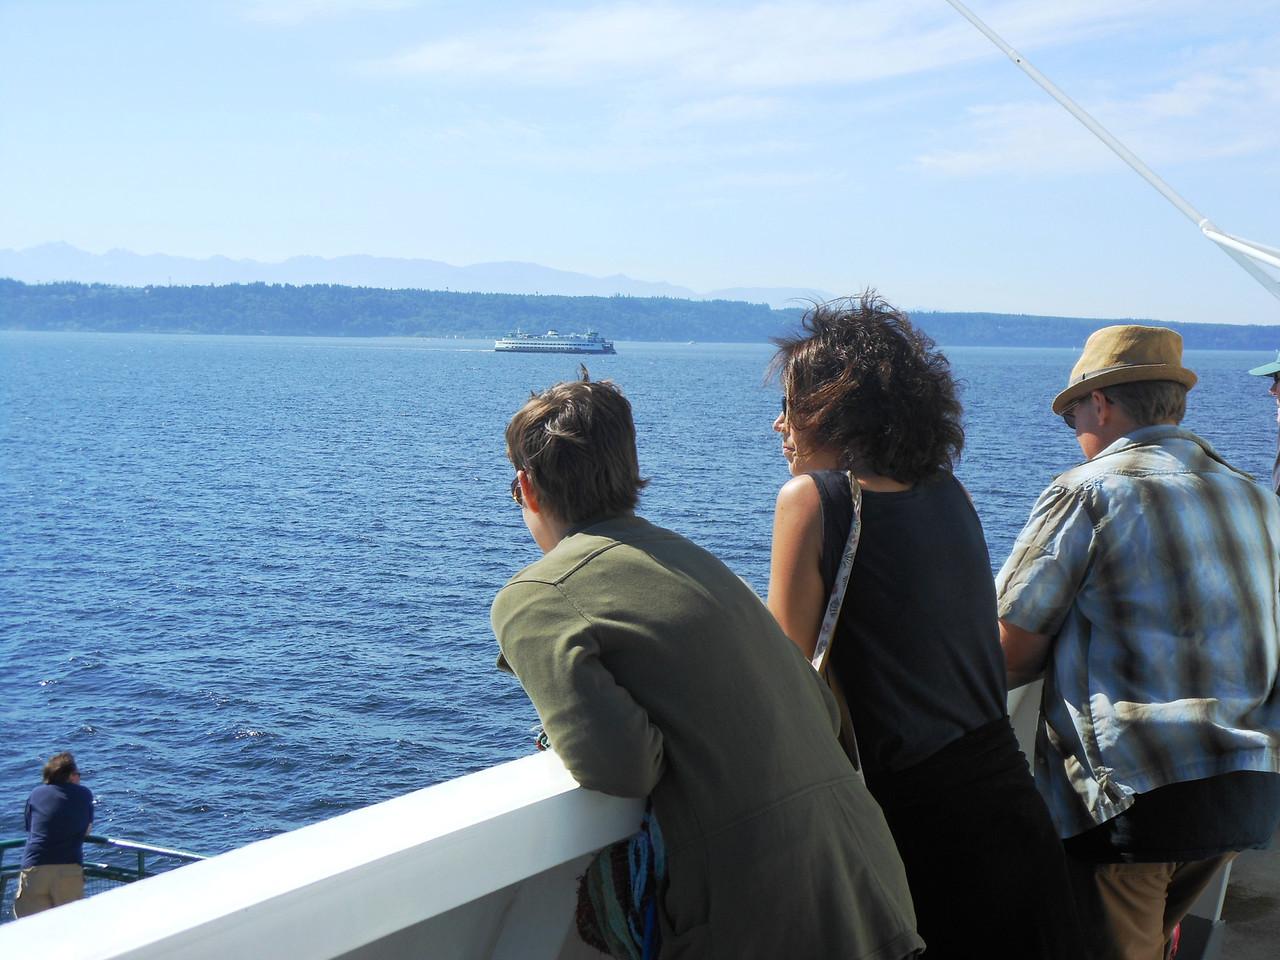 Ferry from Edmonds to Kingston (Kitsap Peninsula) w/Susan, Steven & Sabina